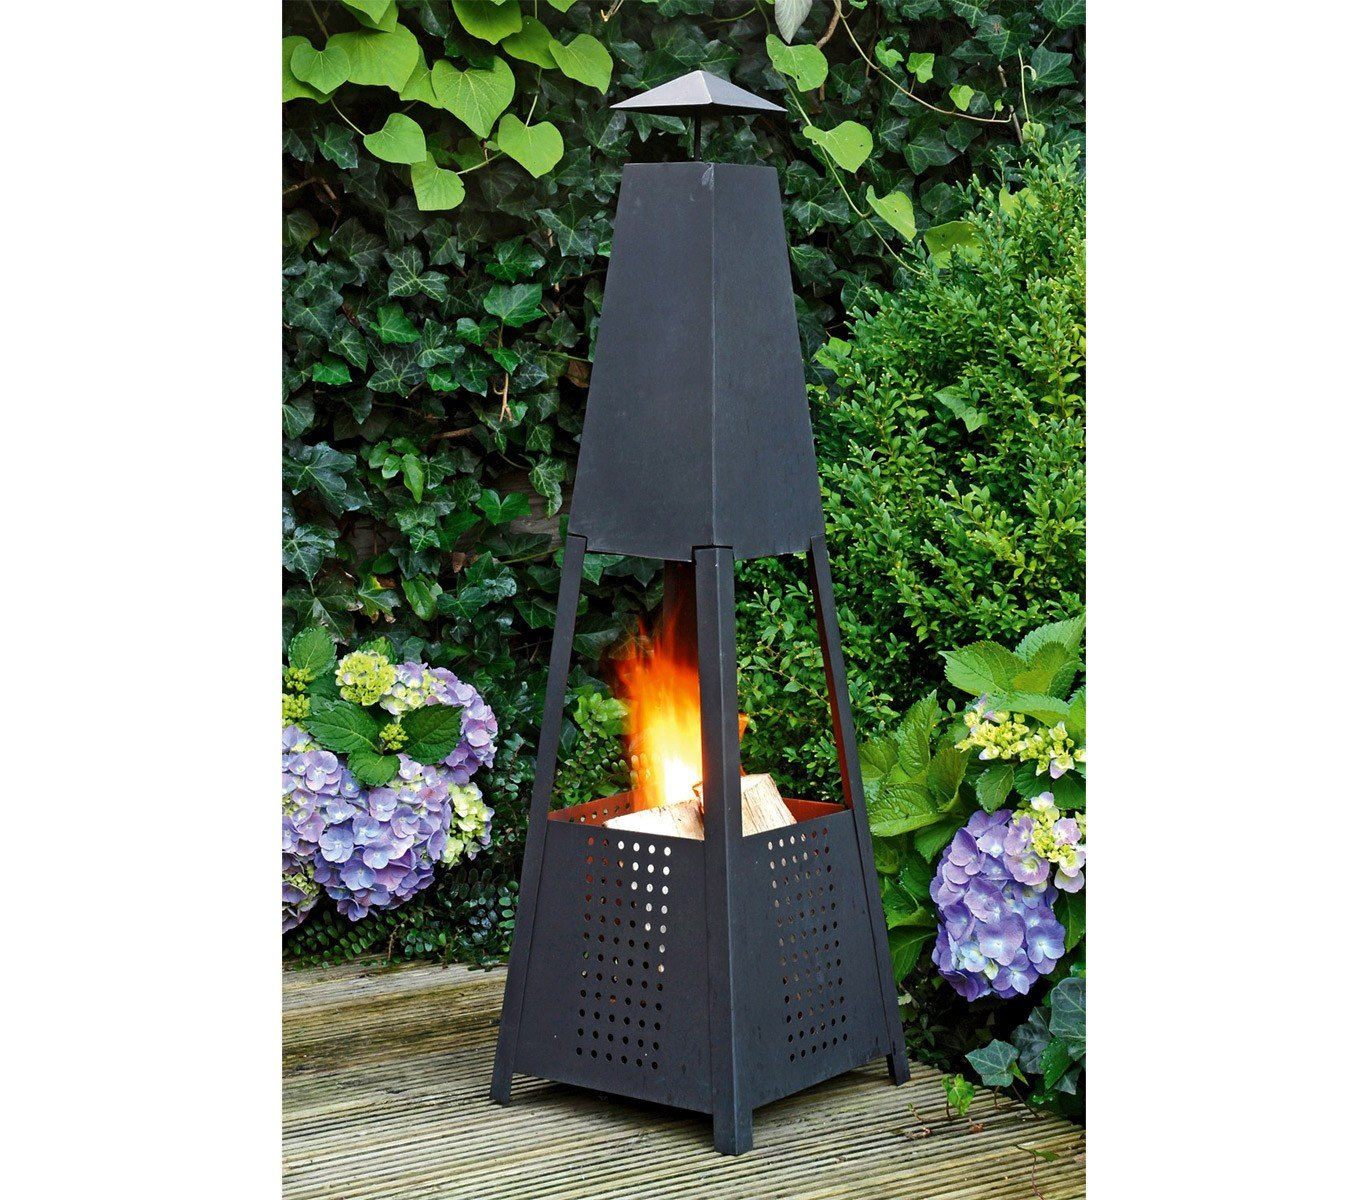 65865 Estufa a leña o carbón de jardín piramidal Altura C.A 100 cm. Media Wave Store®: Amazon.es: Hogar